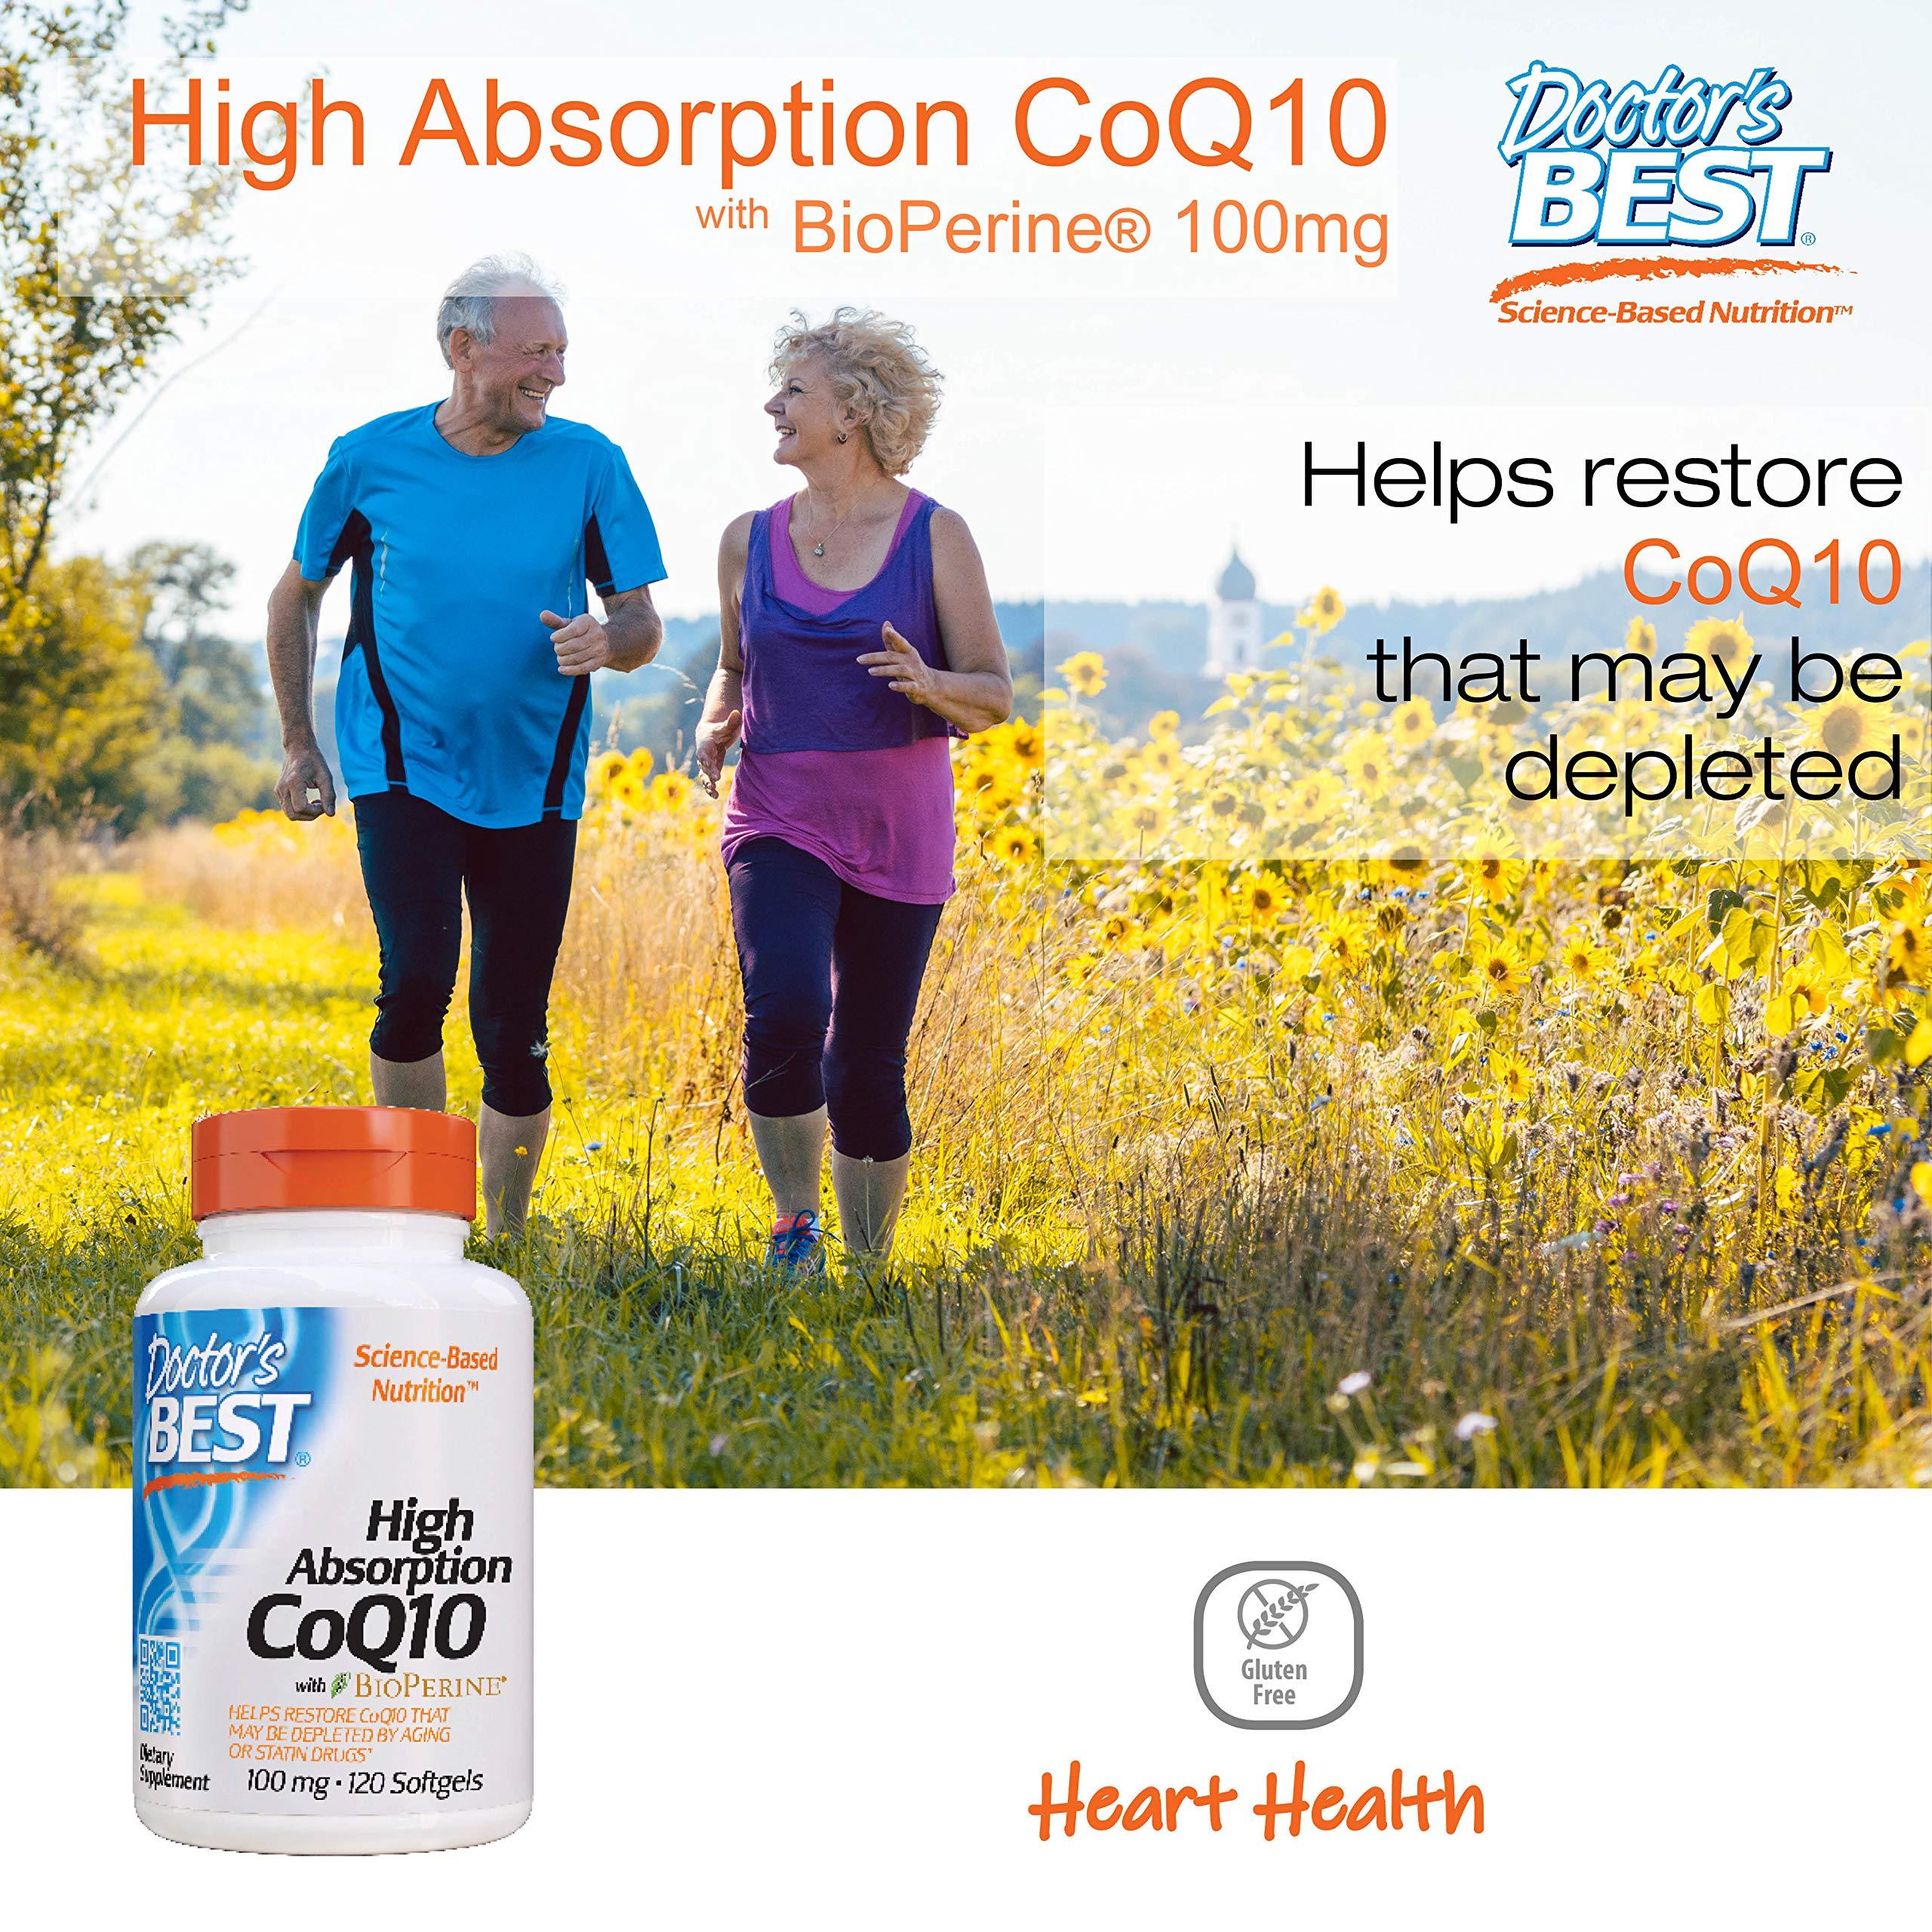 High Absorption CoQ10 with BioPerine